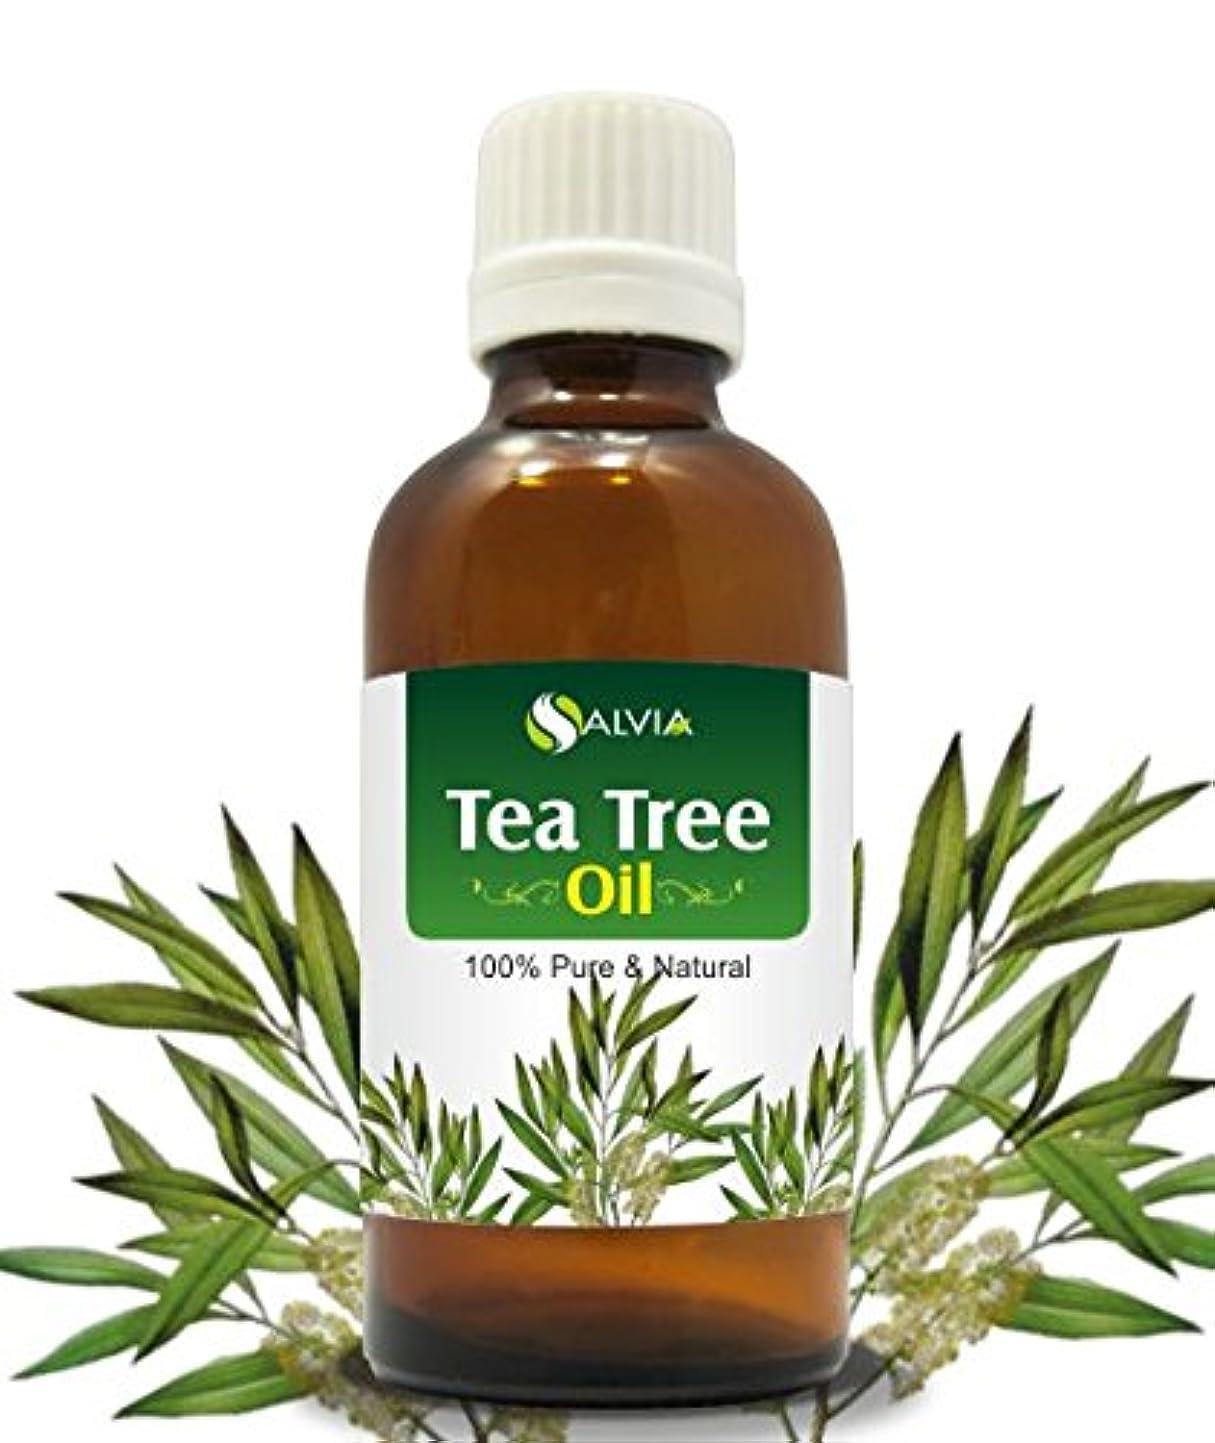 TEA TREE OIL 100% NATURAL PURE UNDILUTED UNCUT ESSENTIAL OIL 15ML